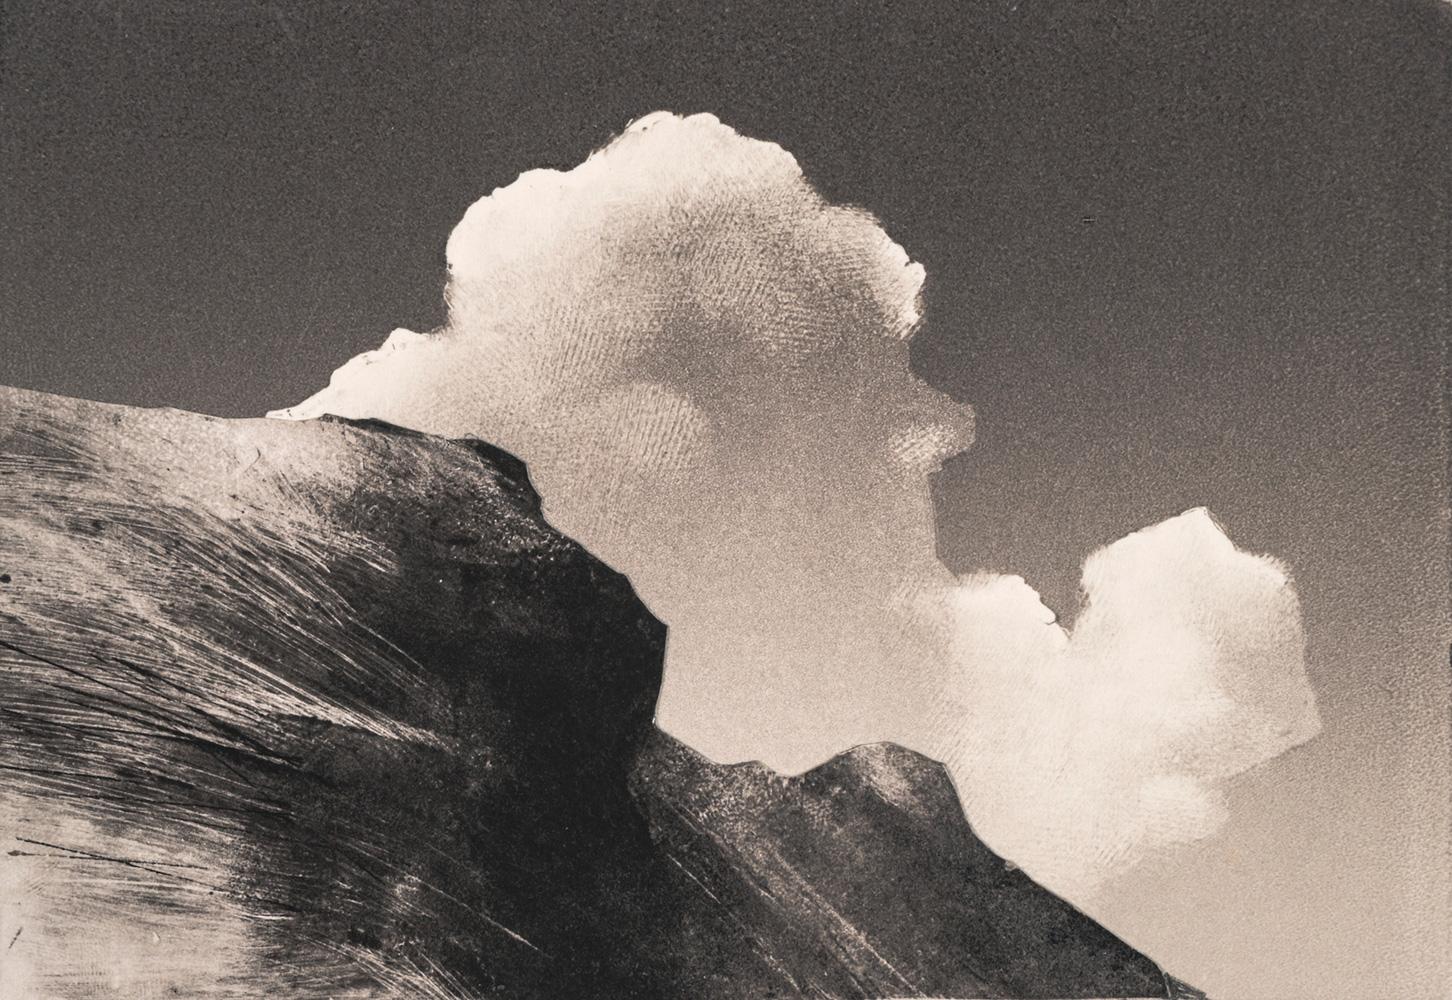 27.rockaway-with-cumulus-cloud